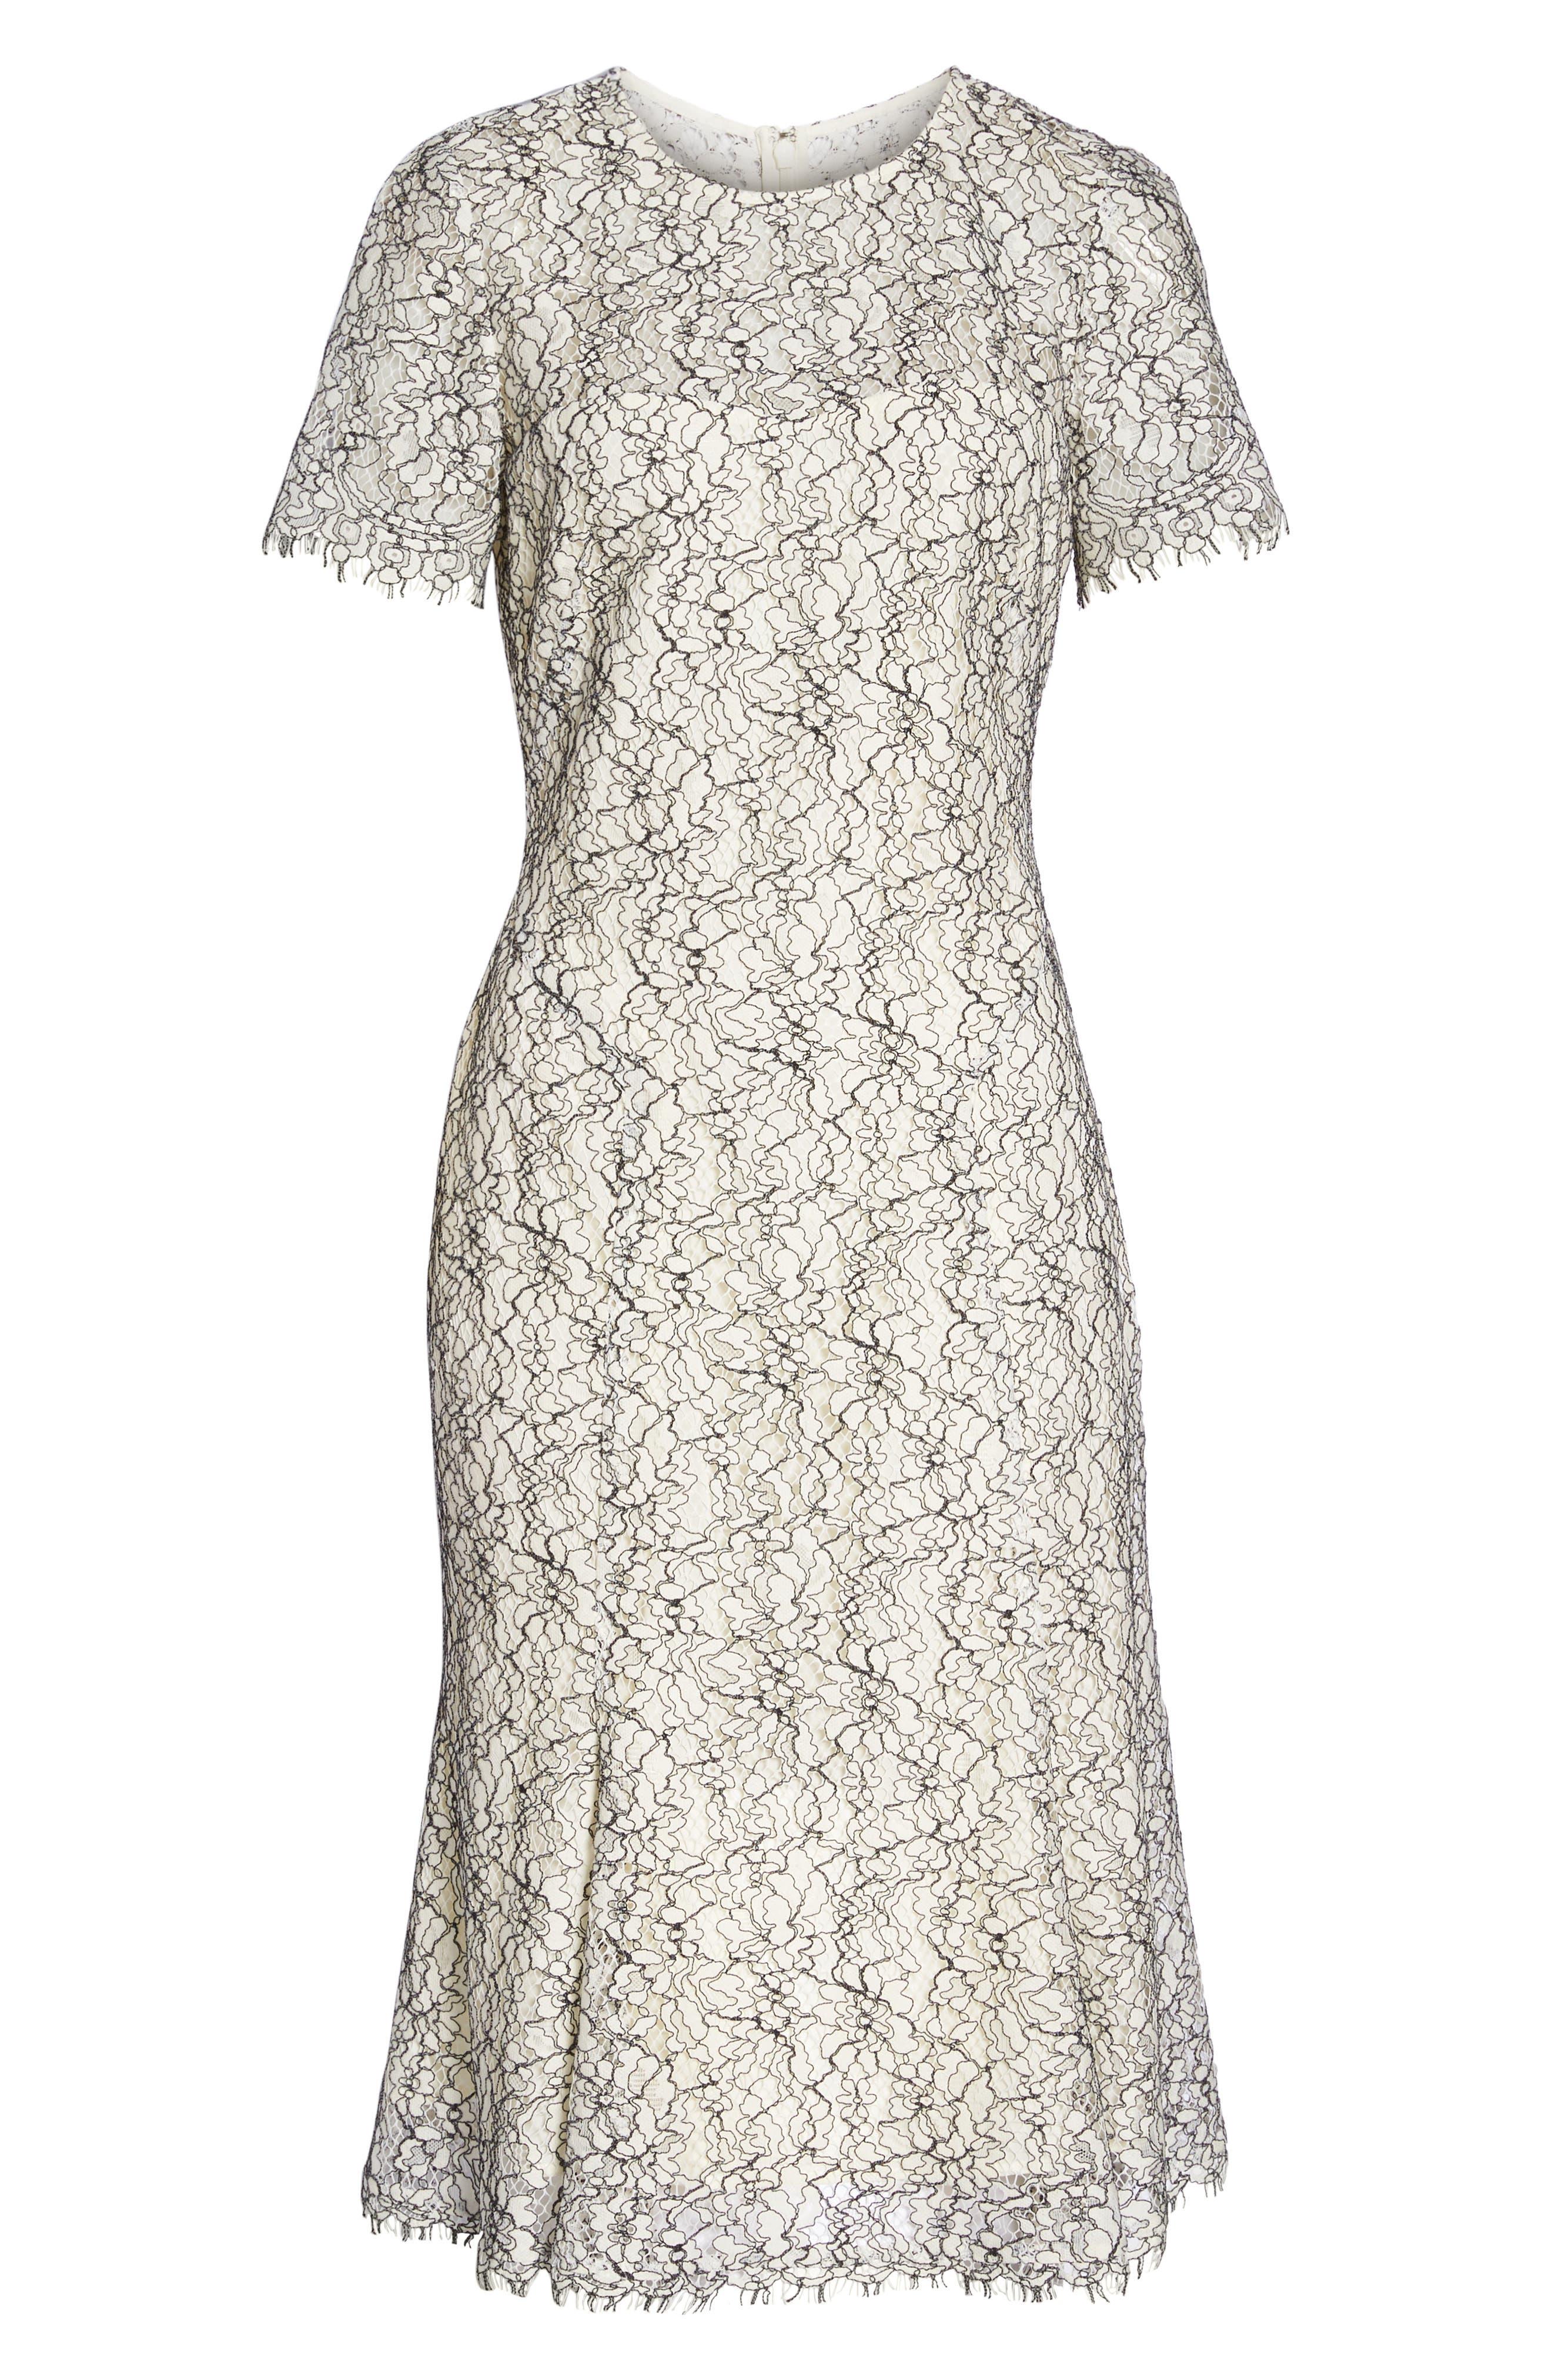 Two-Tone Lace A-Line Dress,                             Alternate thumbnail 7, color,                             902